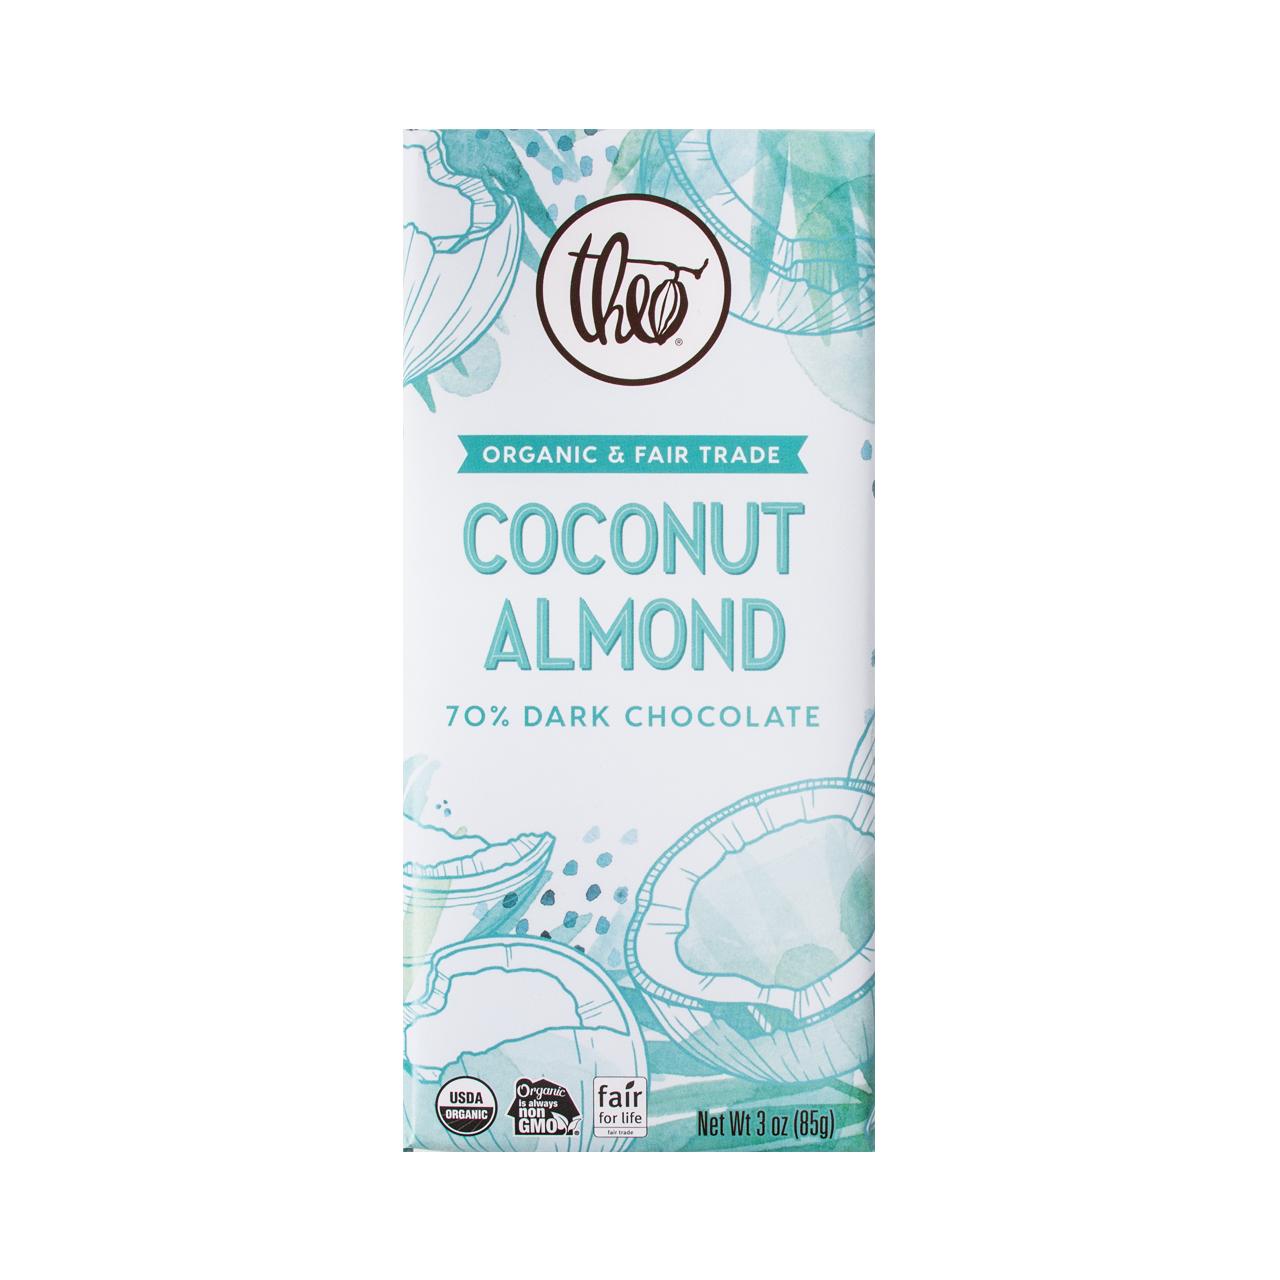 Theo Coconut Almond 70% Dark Chocolate Bar